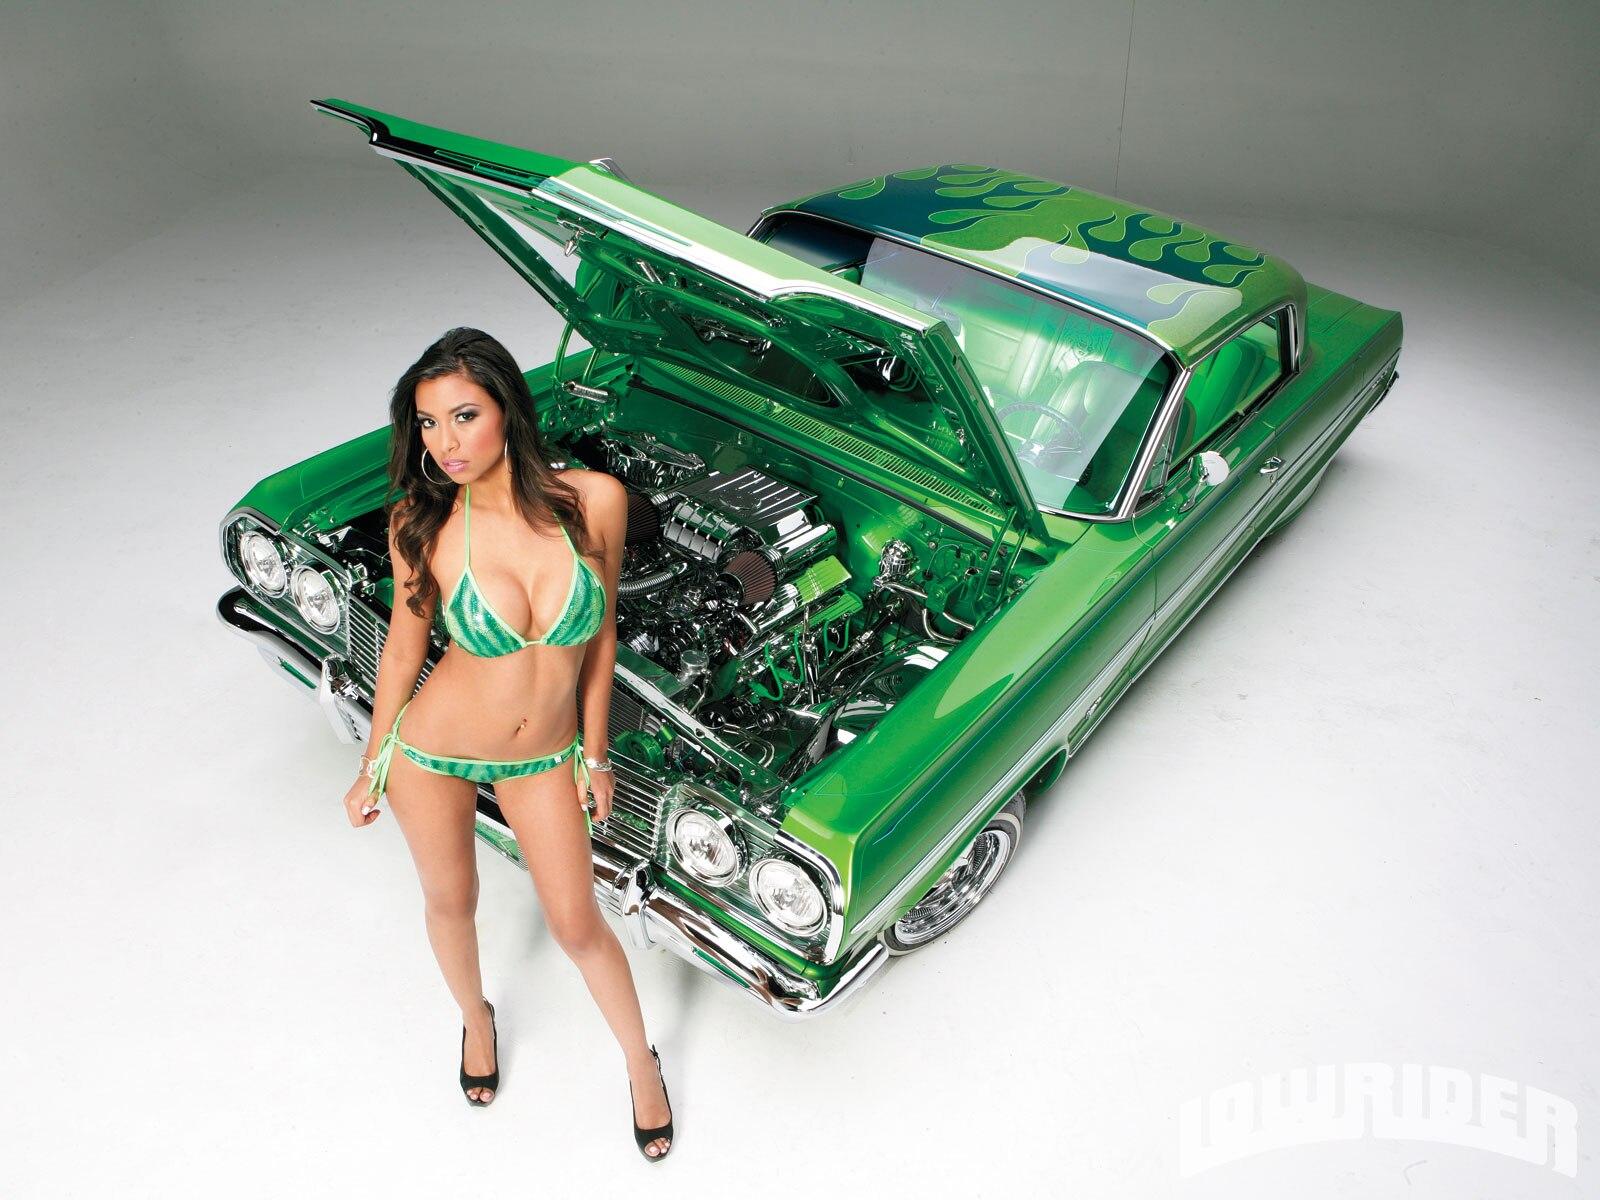 Girls lowrider nude magazine